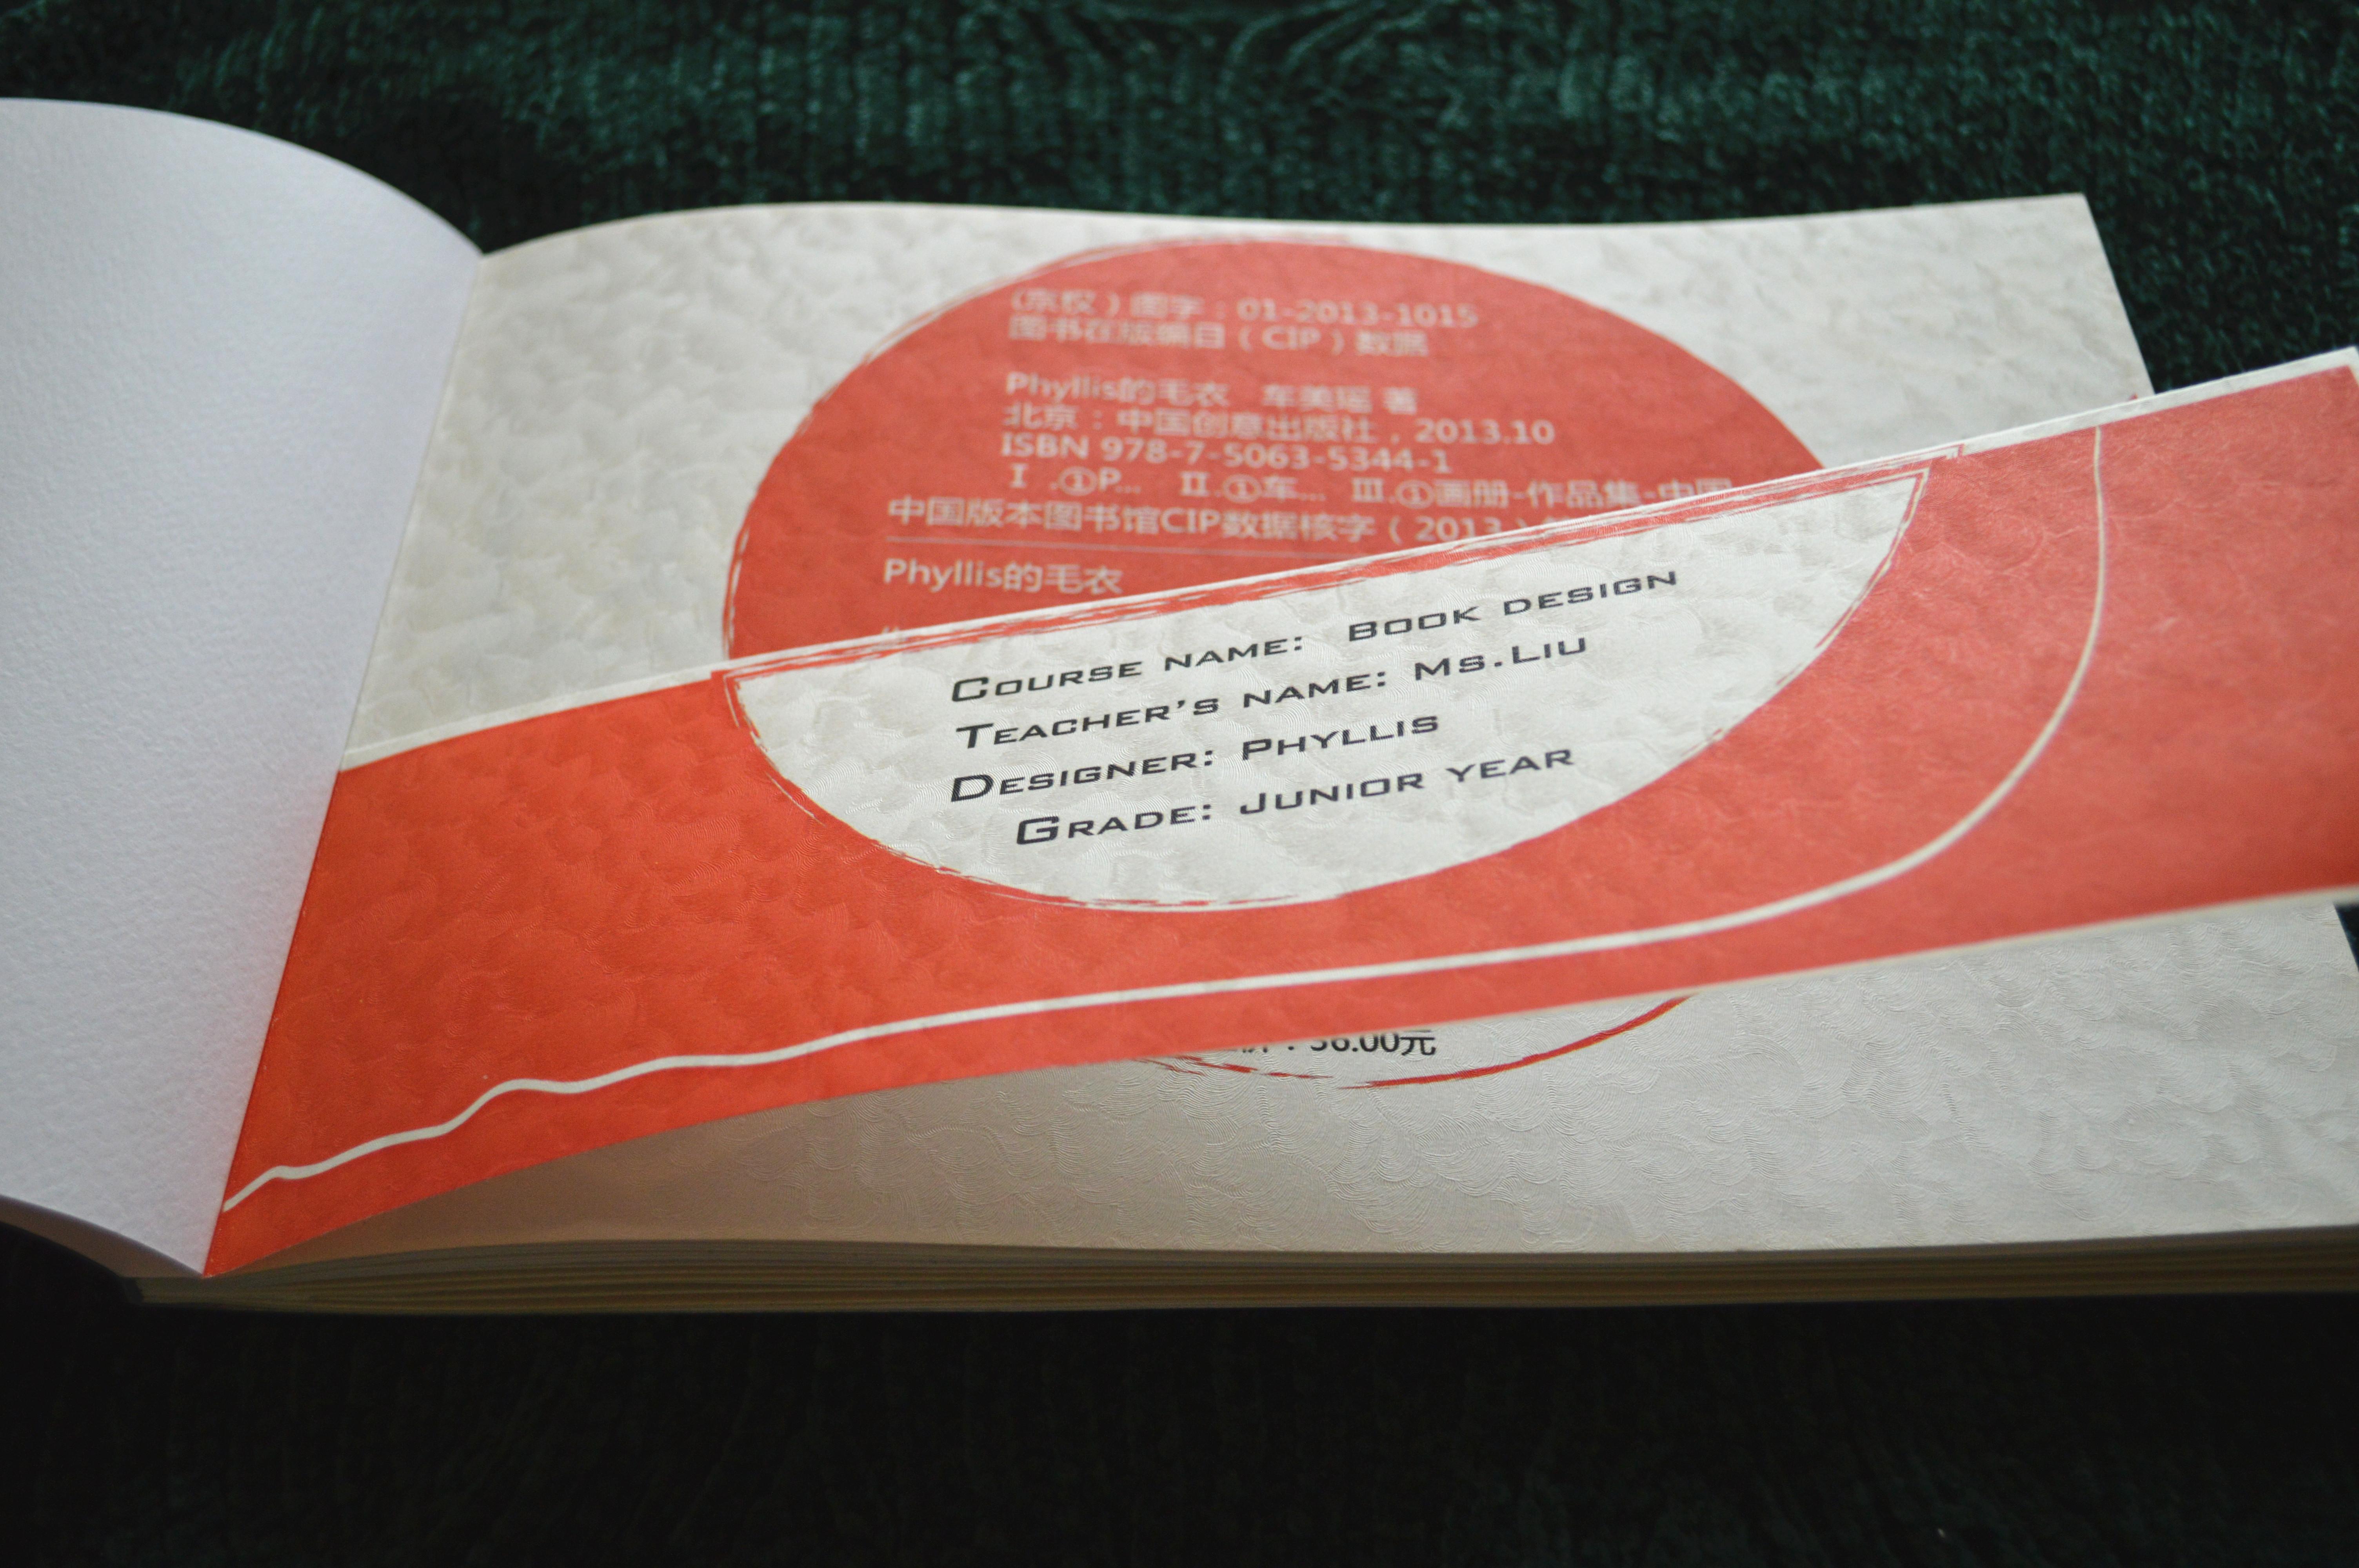 author's information